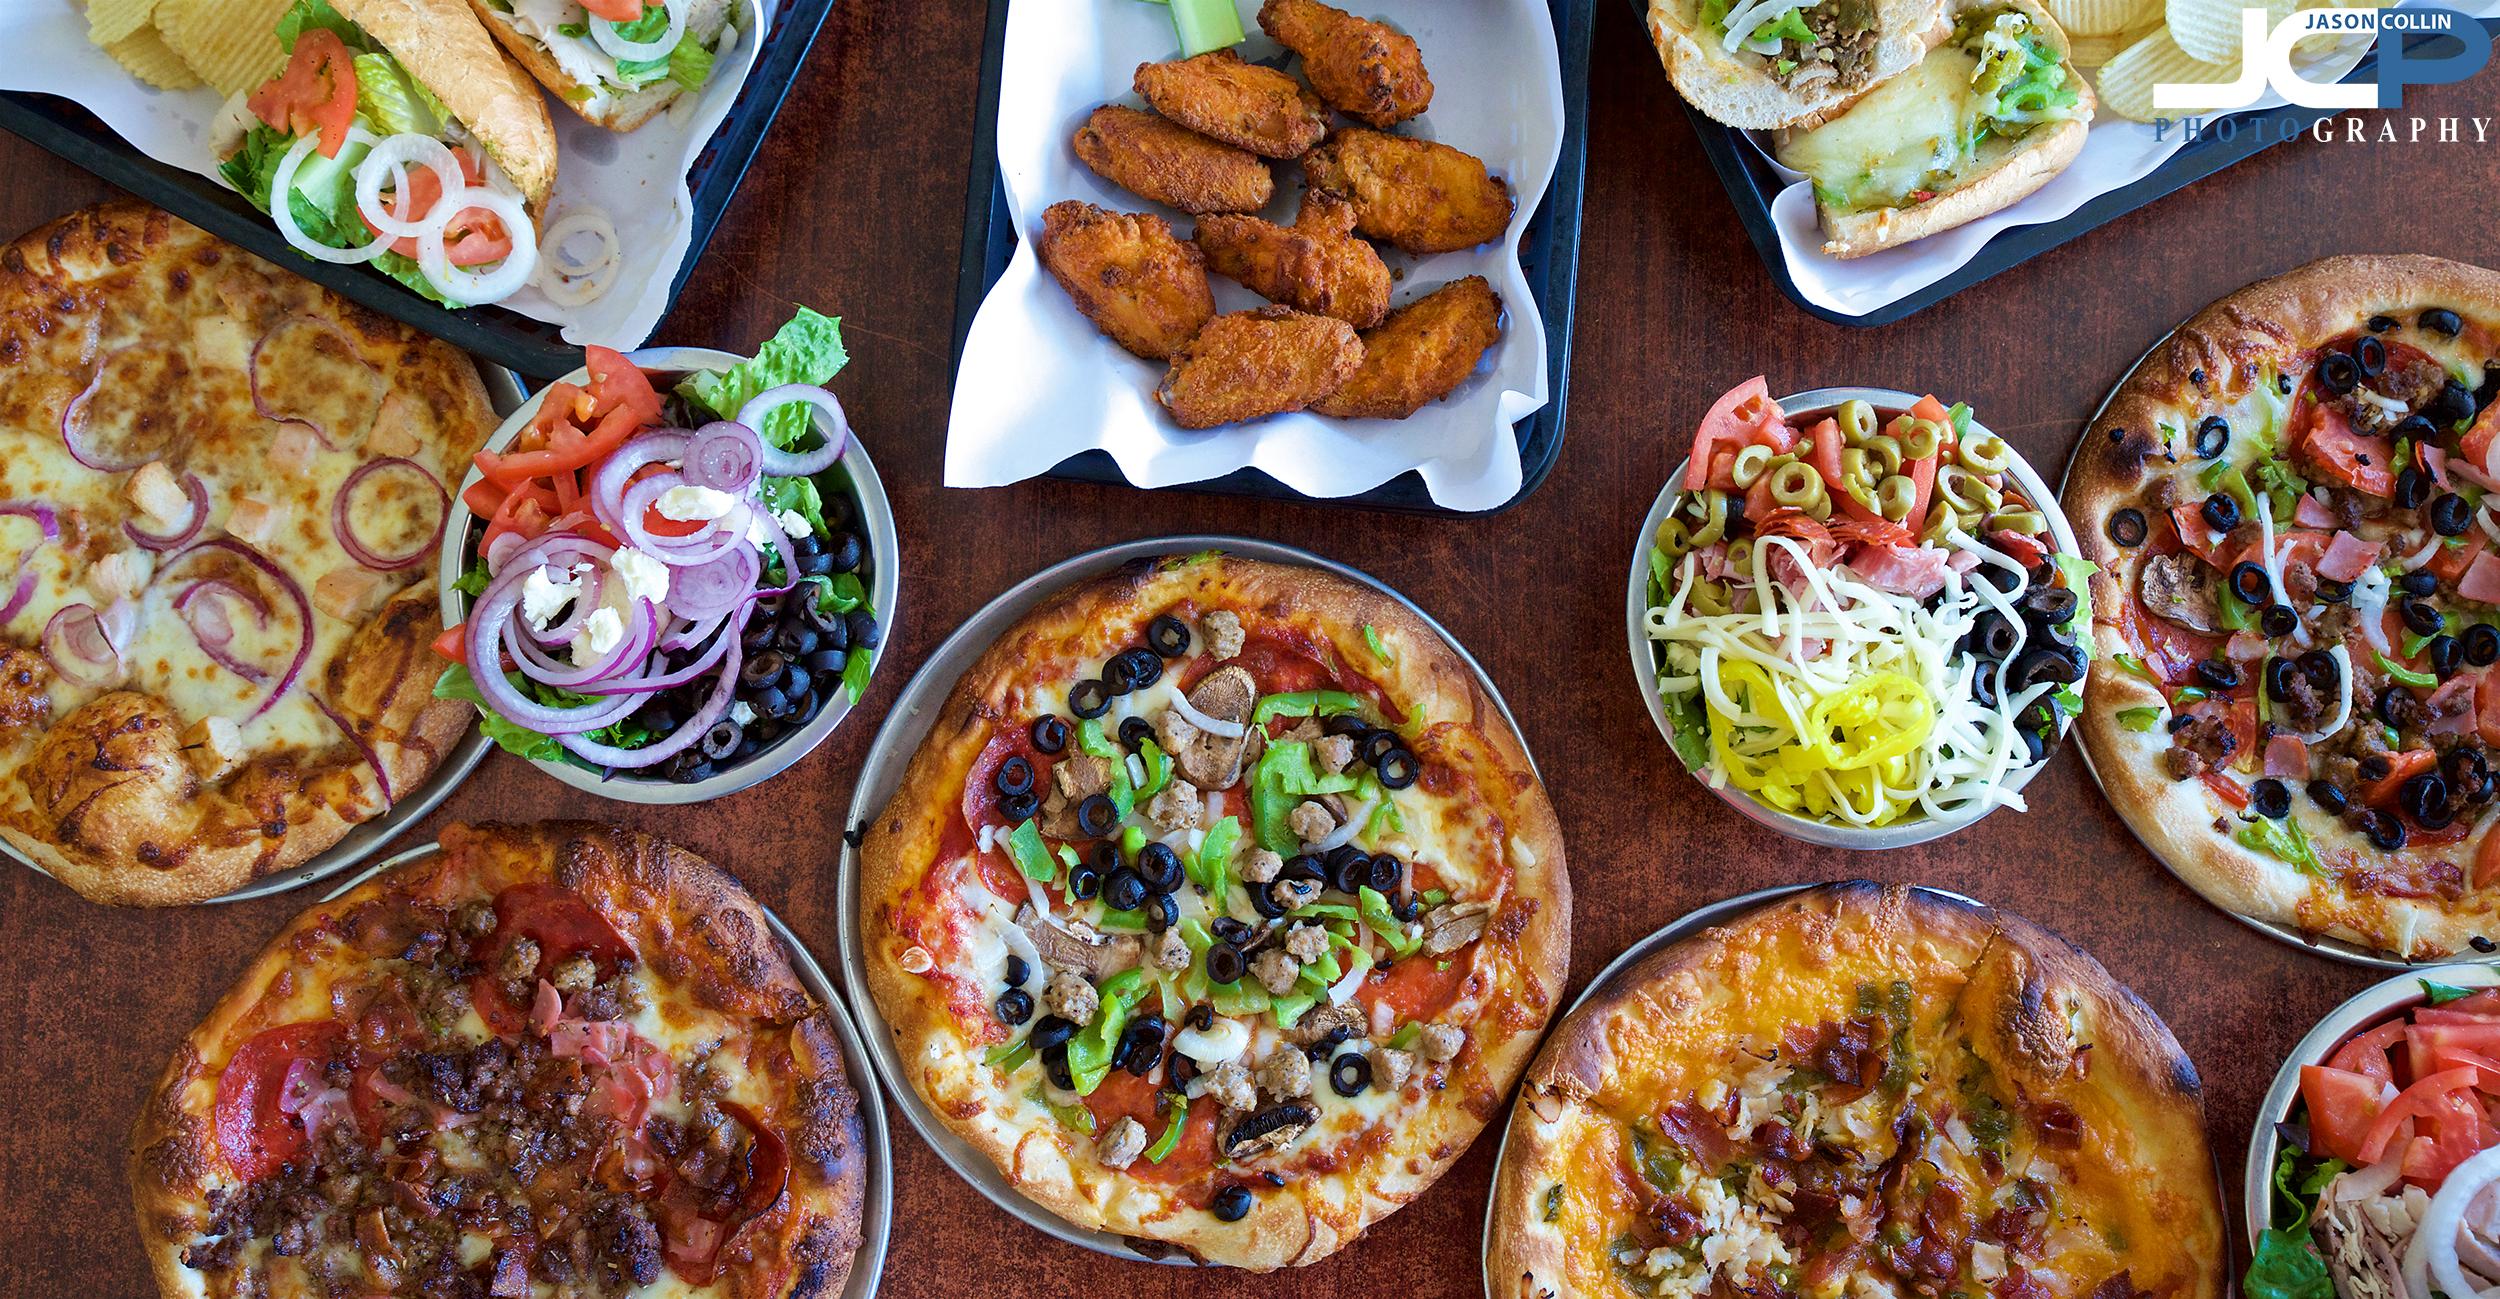 pizza-abq-food-photography-02.jpg